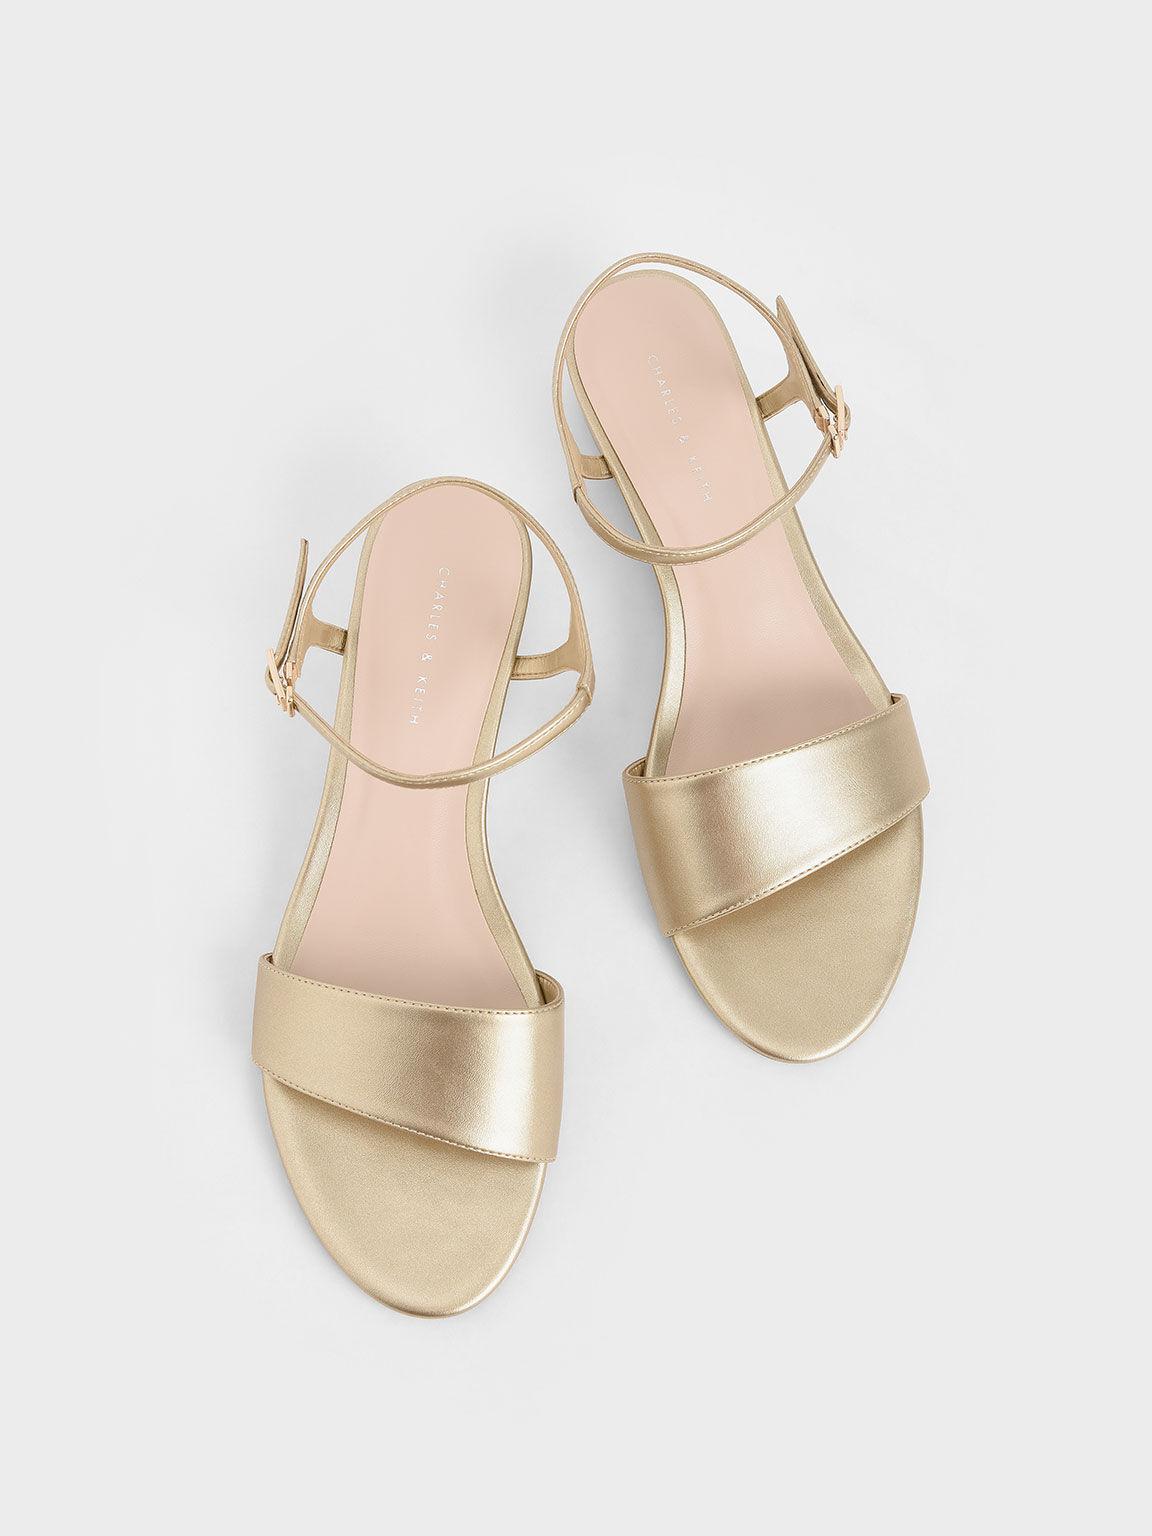 Asymmetric Wedge Sandals, Gold, hi-res